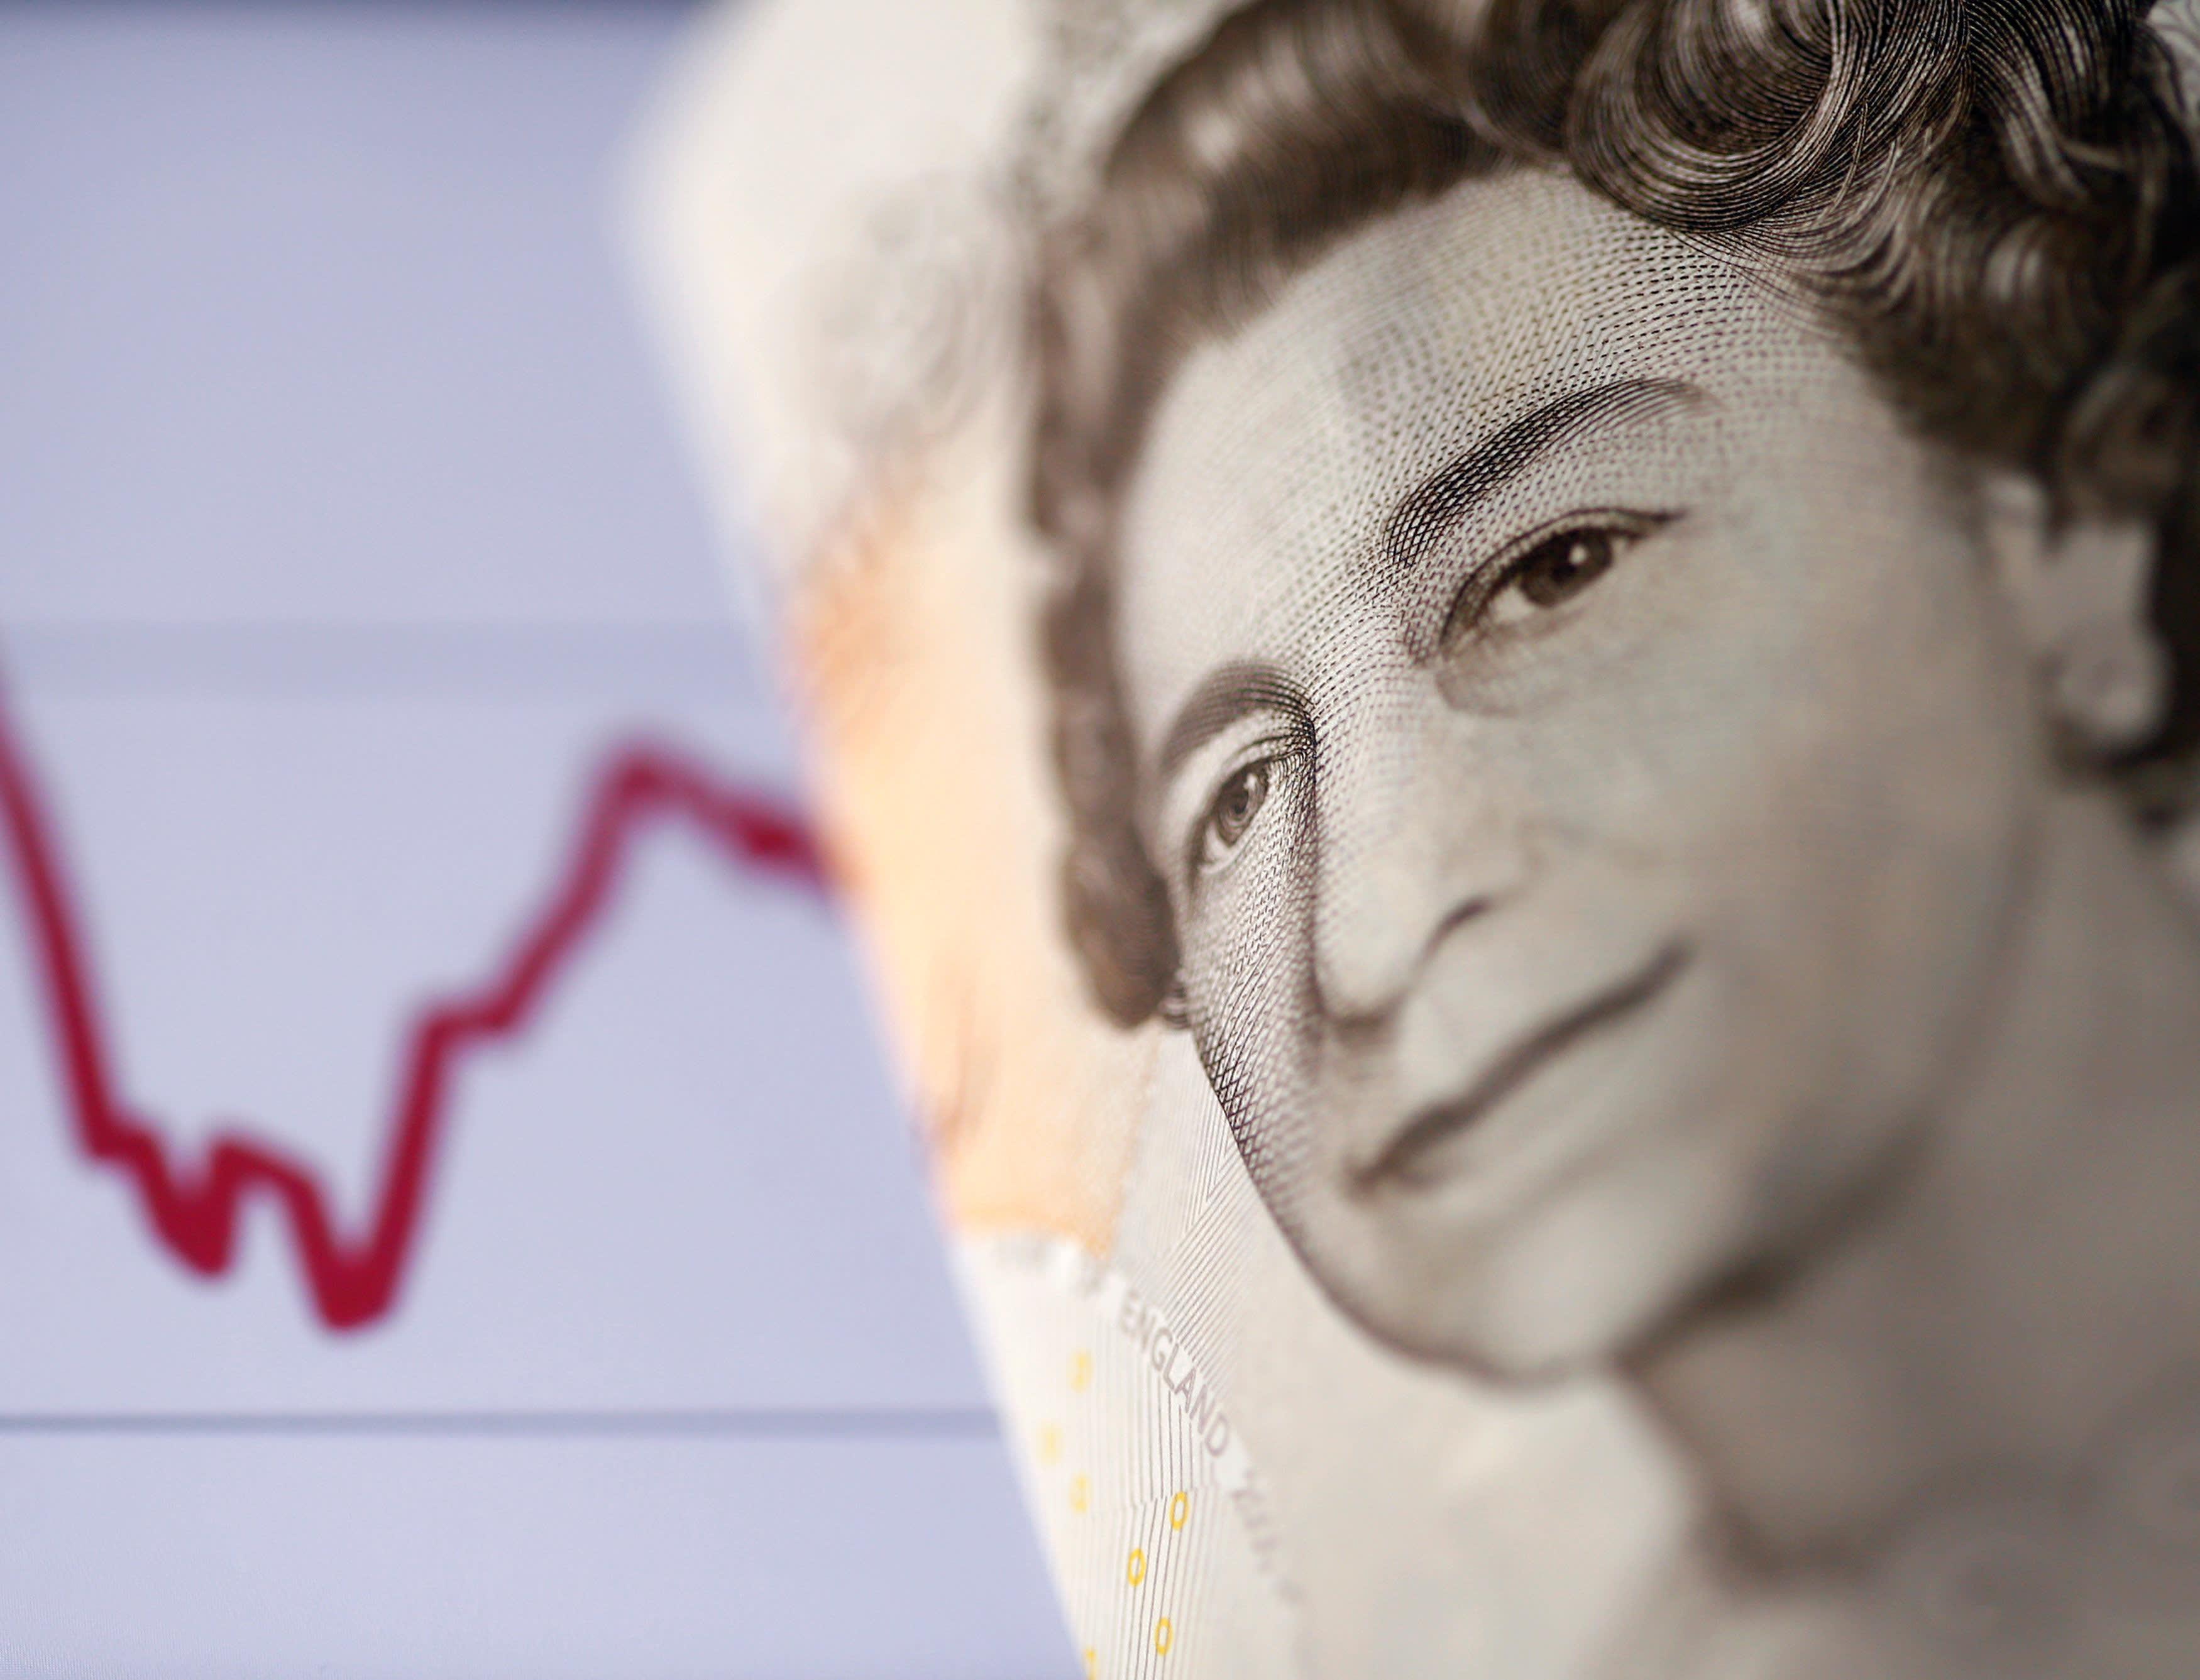 Merian raises £100m with debut trust launch